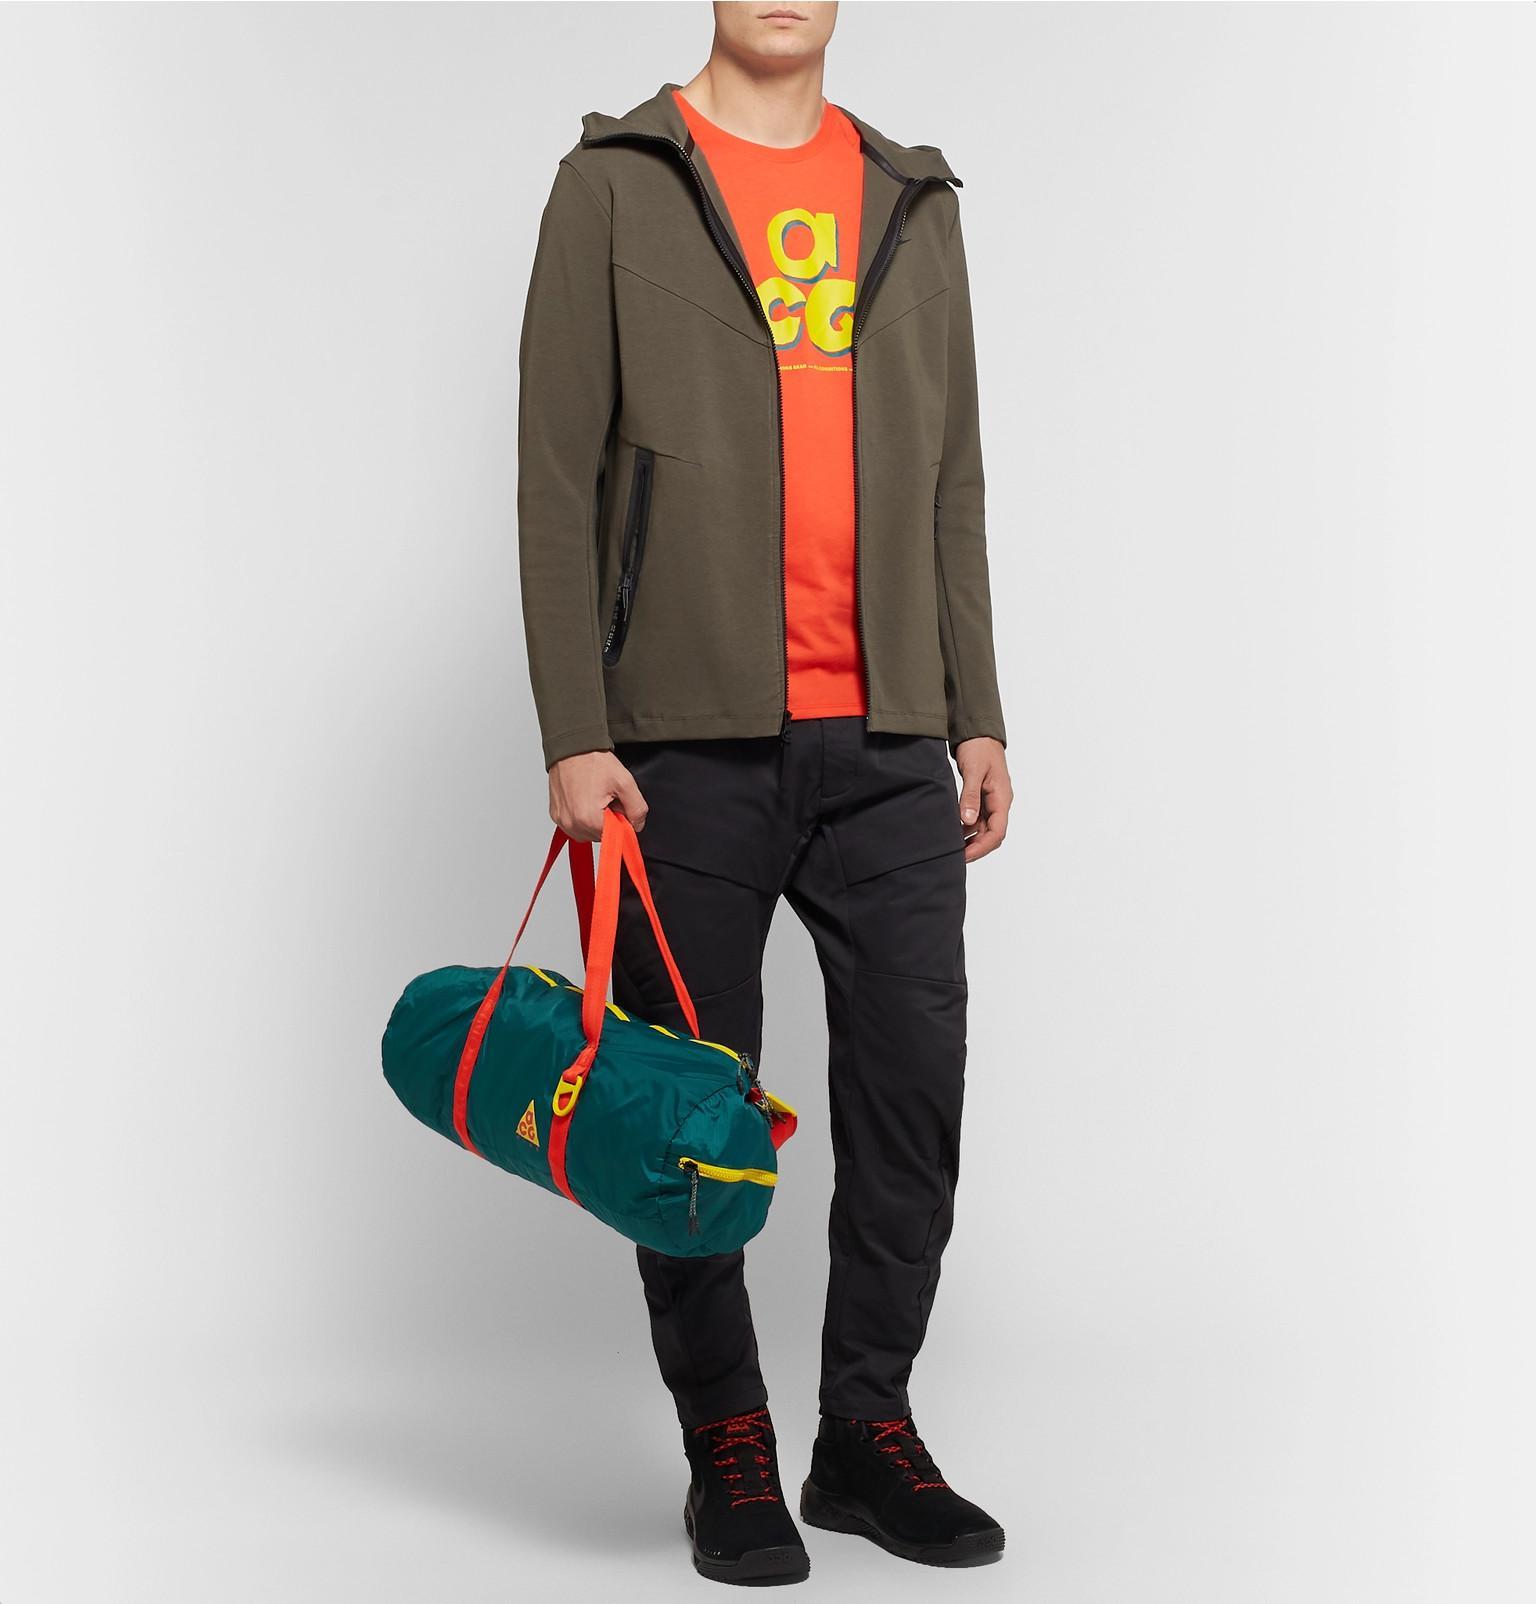 e14b0fe9882f Nike - Multicolor Acg Packable Ripstop Duffle Bag for Men - Lyst. View  fullscreen